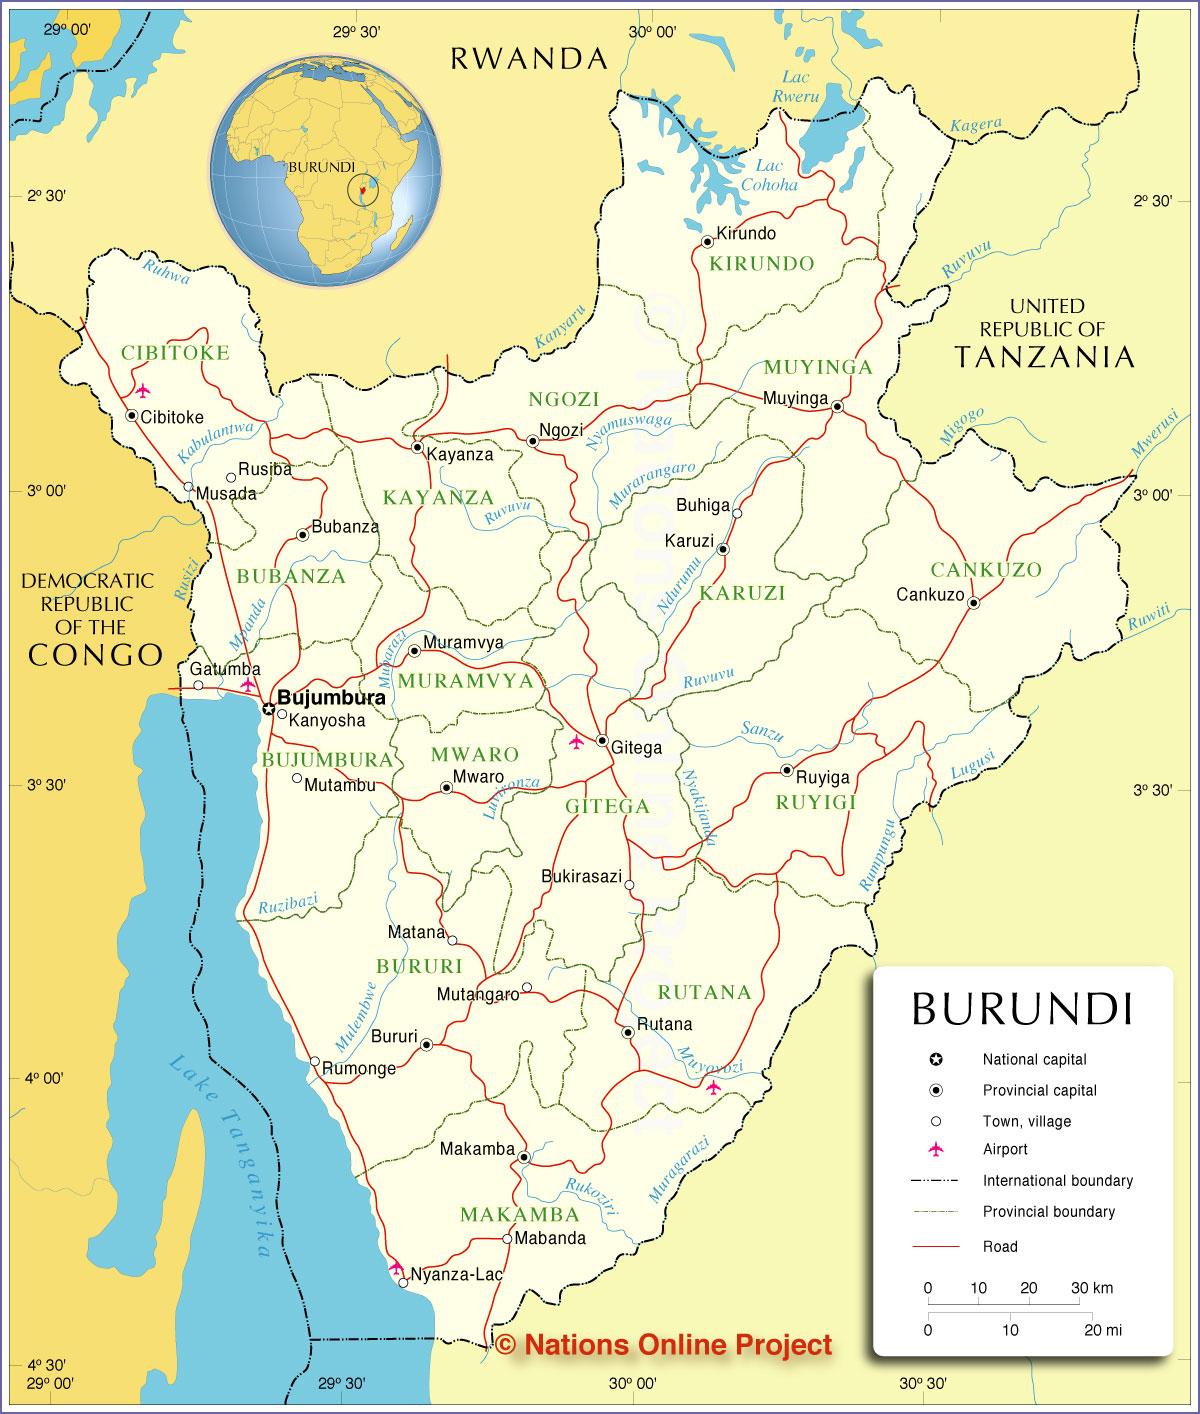 Burundi | Mapas Geográficos do Burundi